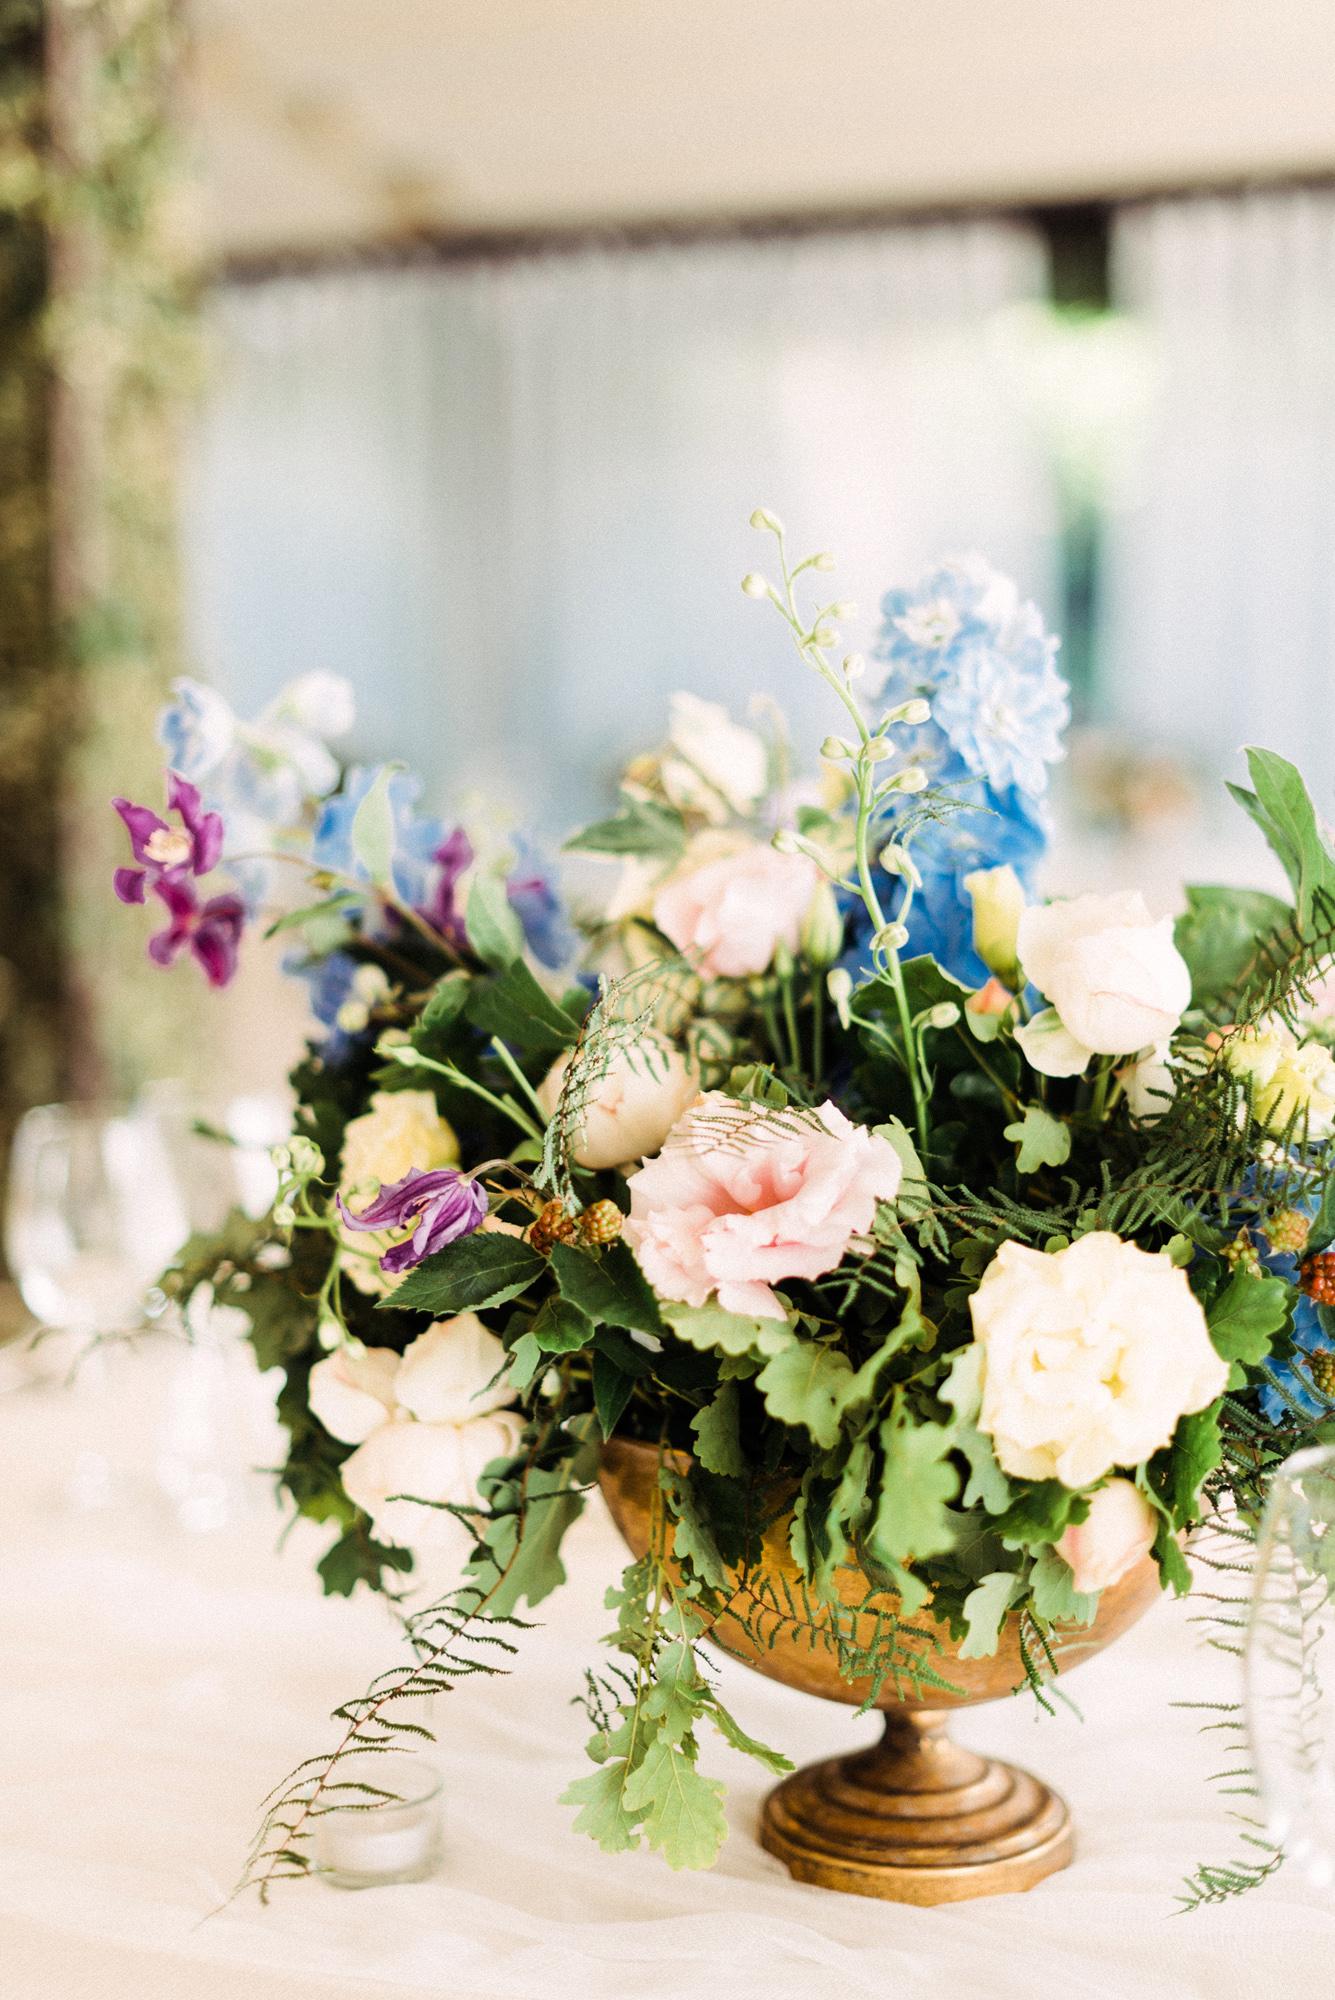 onome efe wedding table centerpieces